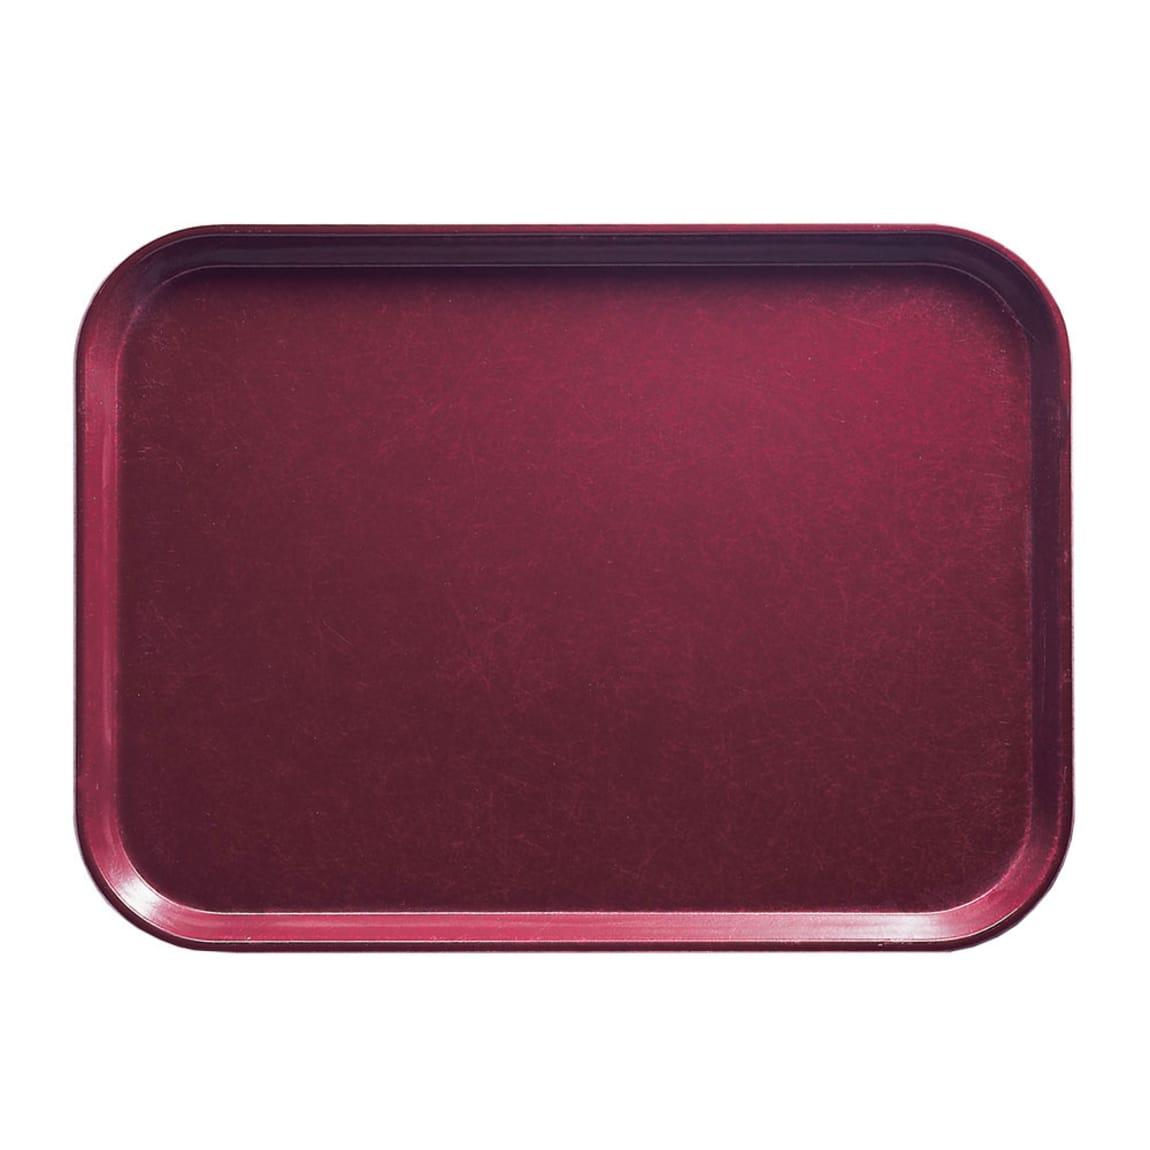 "Cambro 926522 Fiberglass Camtray® Cafeteria Tray - 25.5""L x 8.8""W, Burgundy Wine"